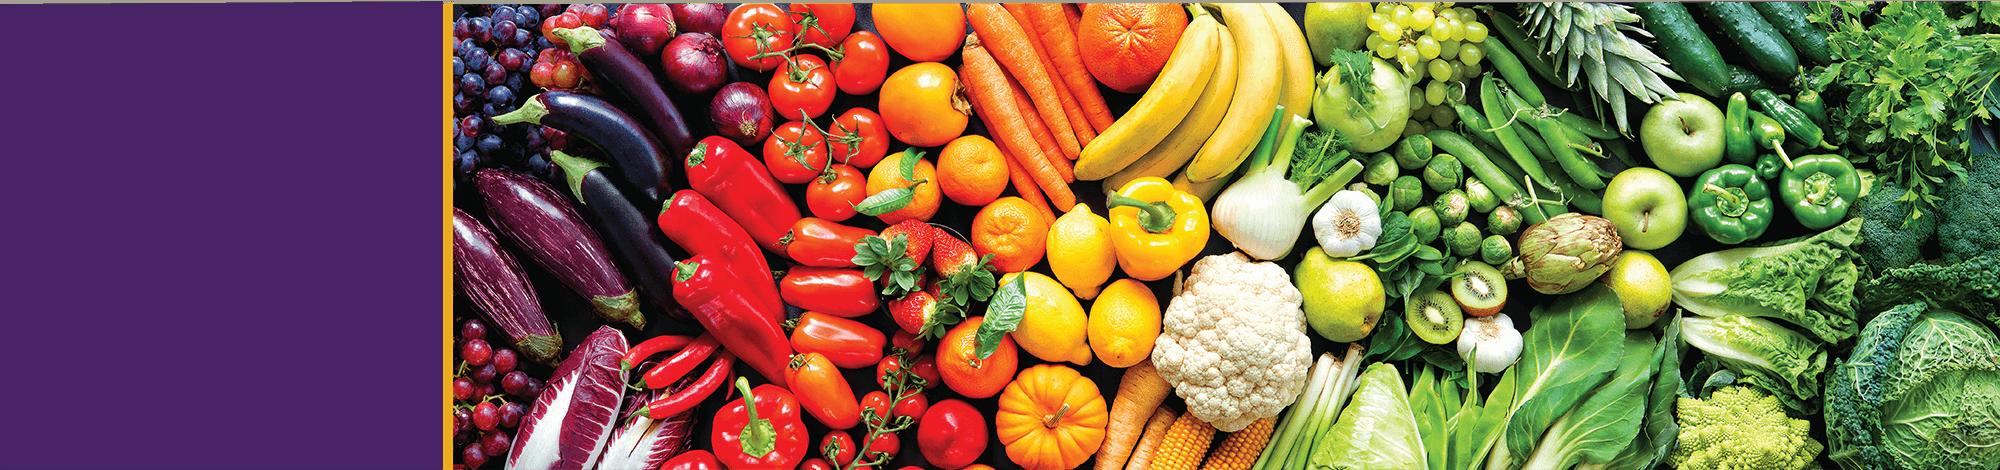 Food Waste Reduction Whitepaper